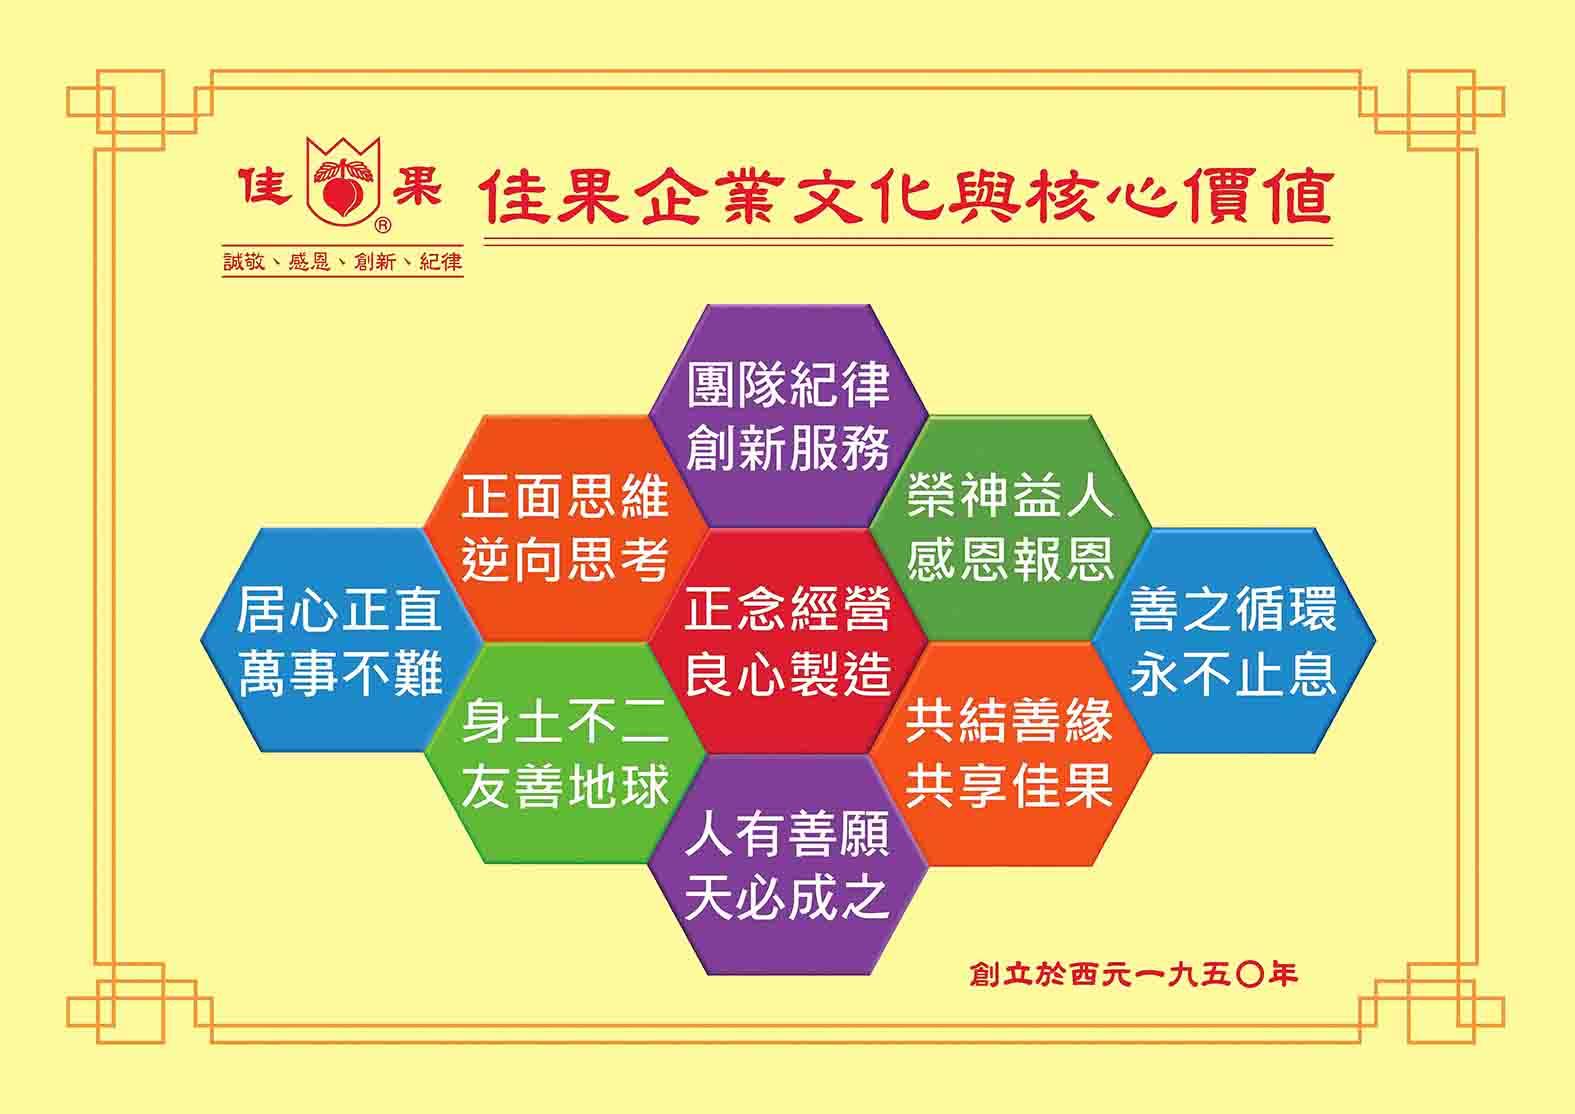 proimages/About_Us/A3_壯佳果尾牙-理念大圖-6-01_(2).jpg